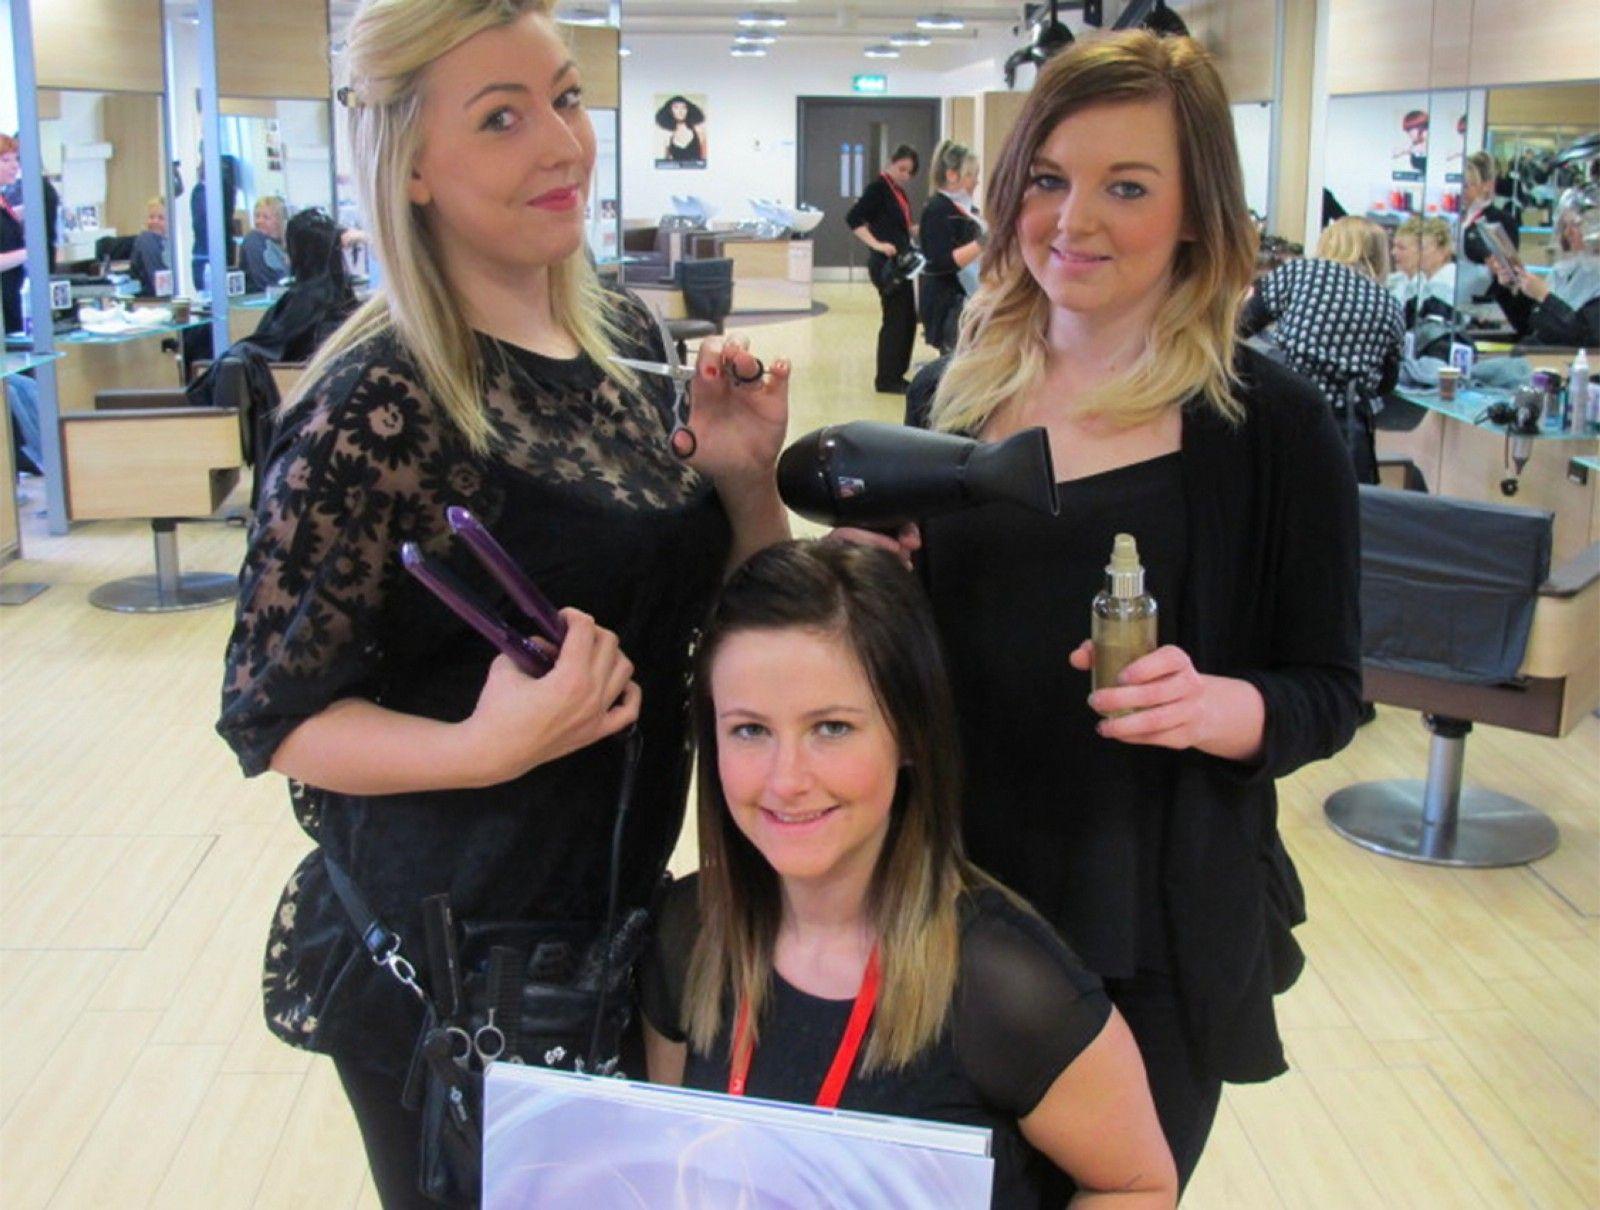 Hairdressers Geelong Best Hairdresser Hairdressing Courses Hairdresser